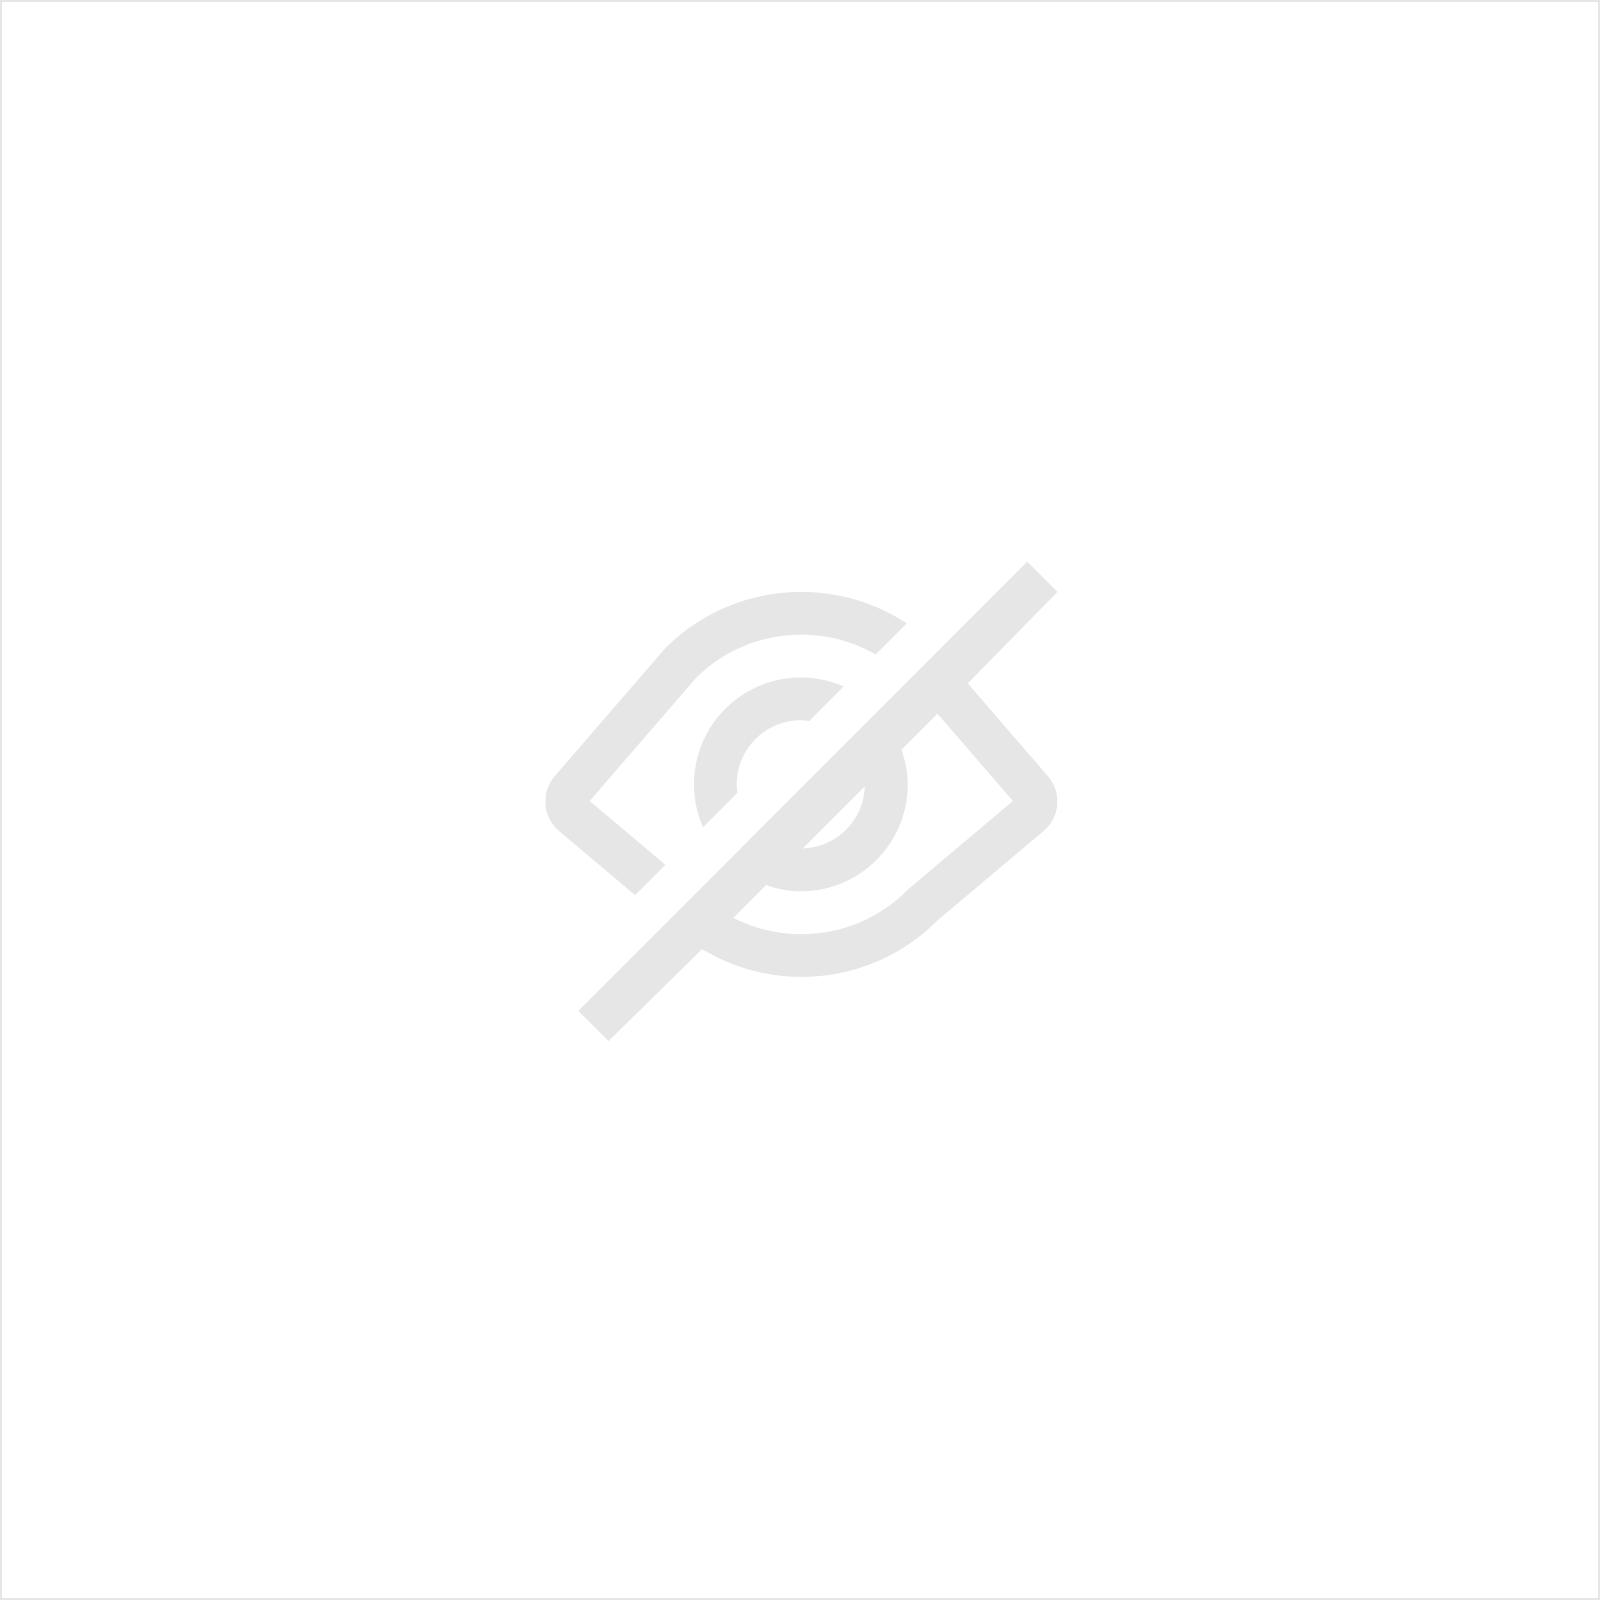 MASTIC POLYESTER RENFORCÉ AVEC DES PARTICULES DE MÉTAL 250G (Fill Métal 9020-250